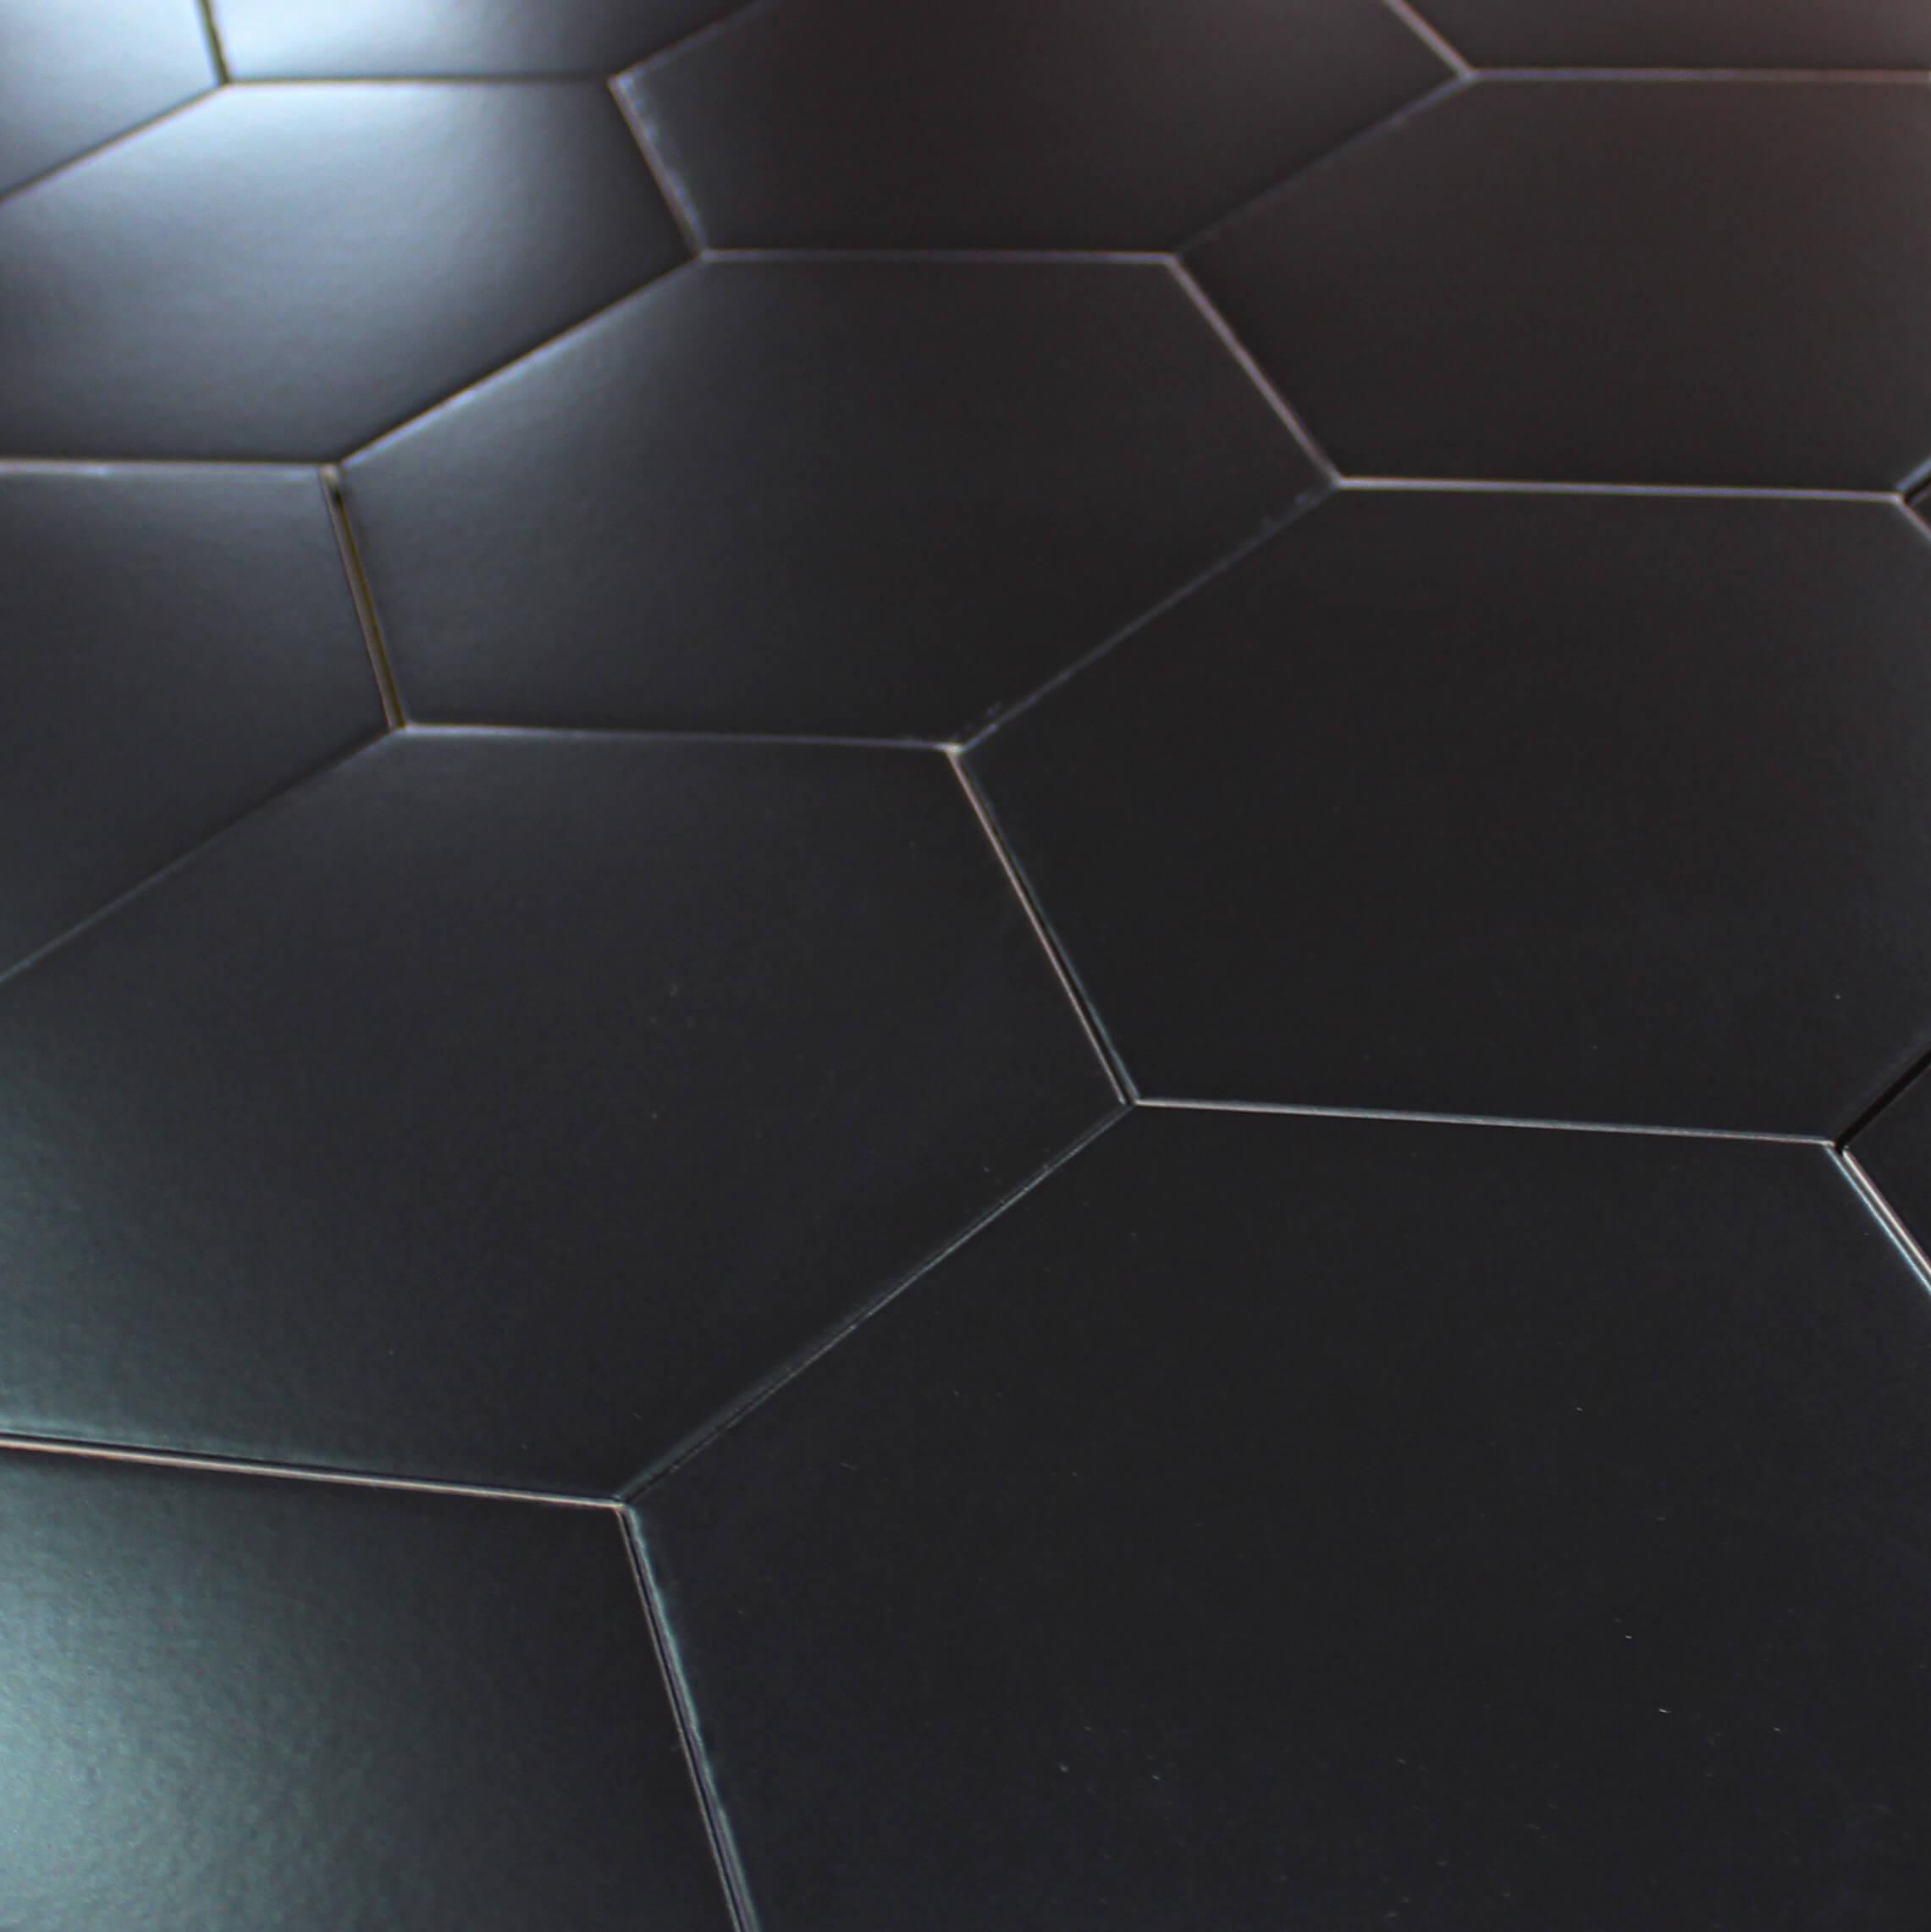 Carrelage hexagonal sol et mur Pattern Noir